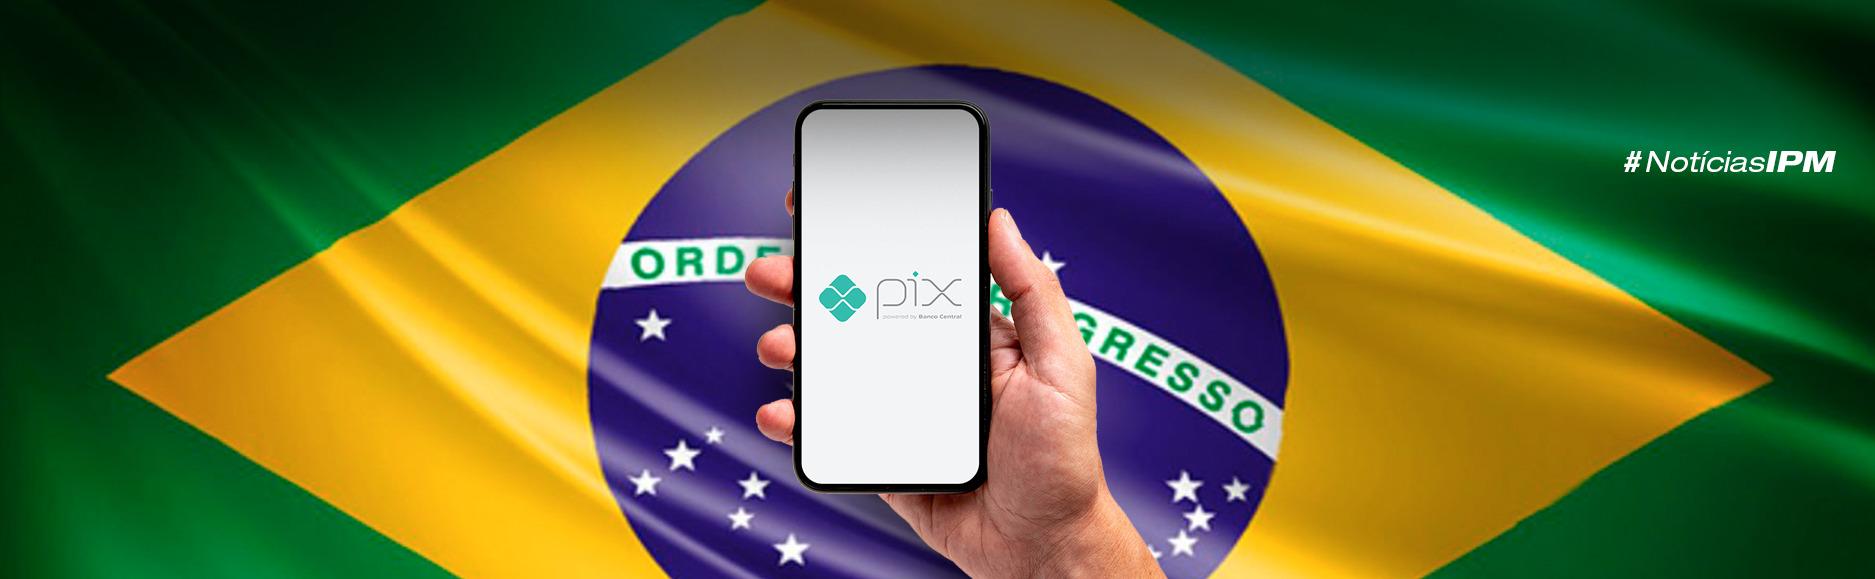 Pagamento via PIX cresce 471% e facilita a vida dos brasileiros